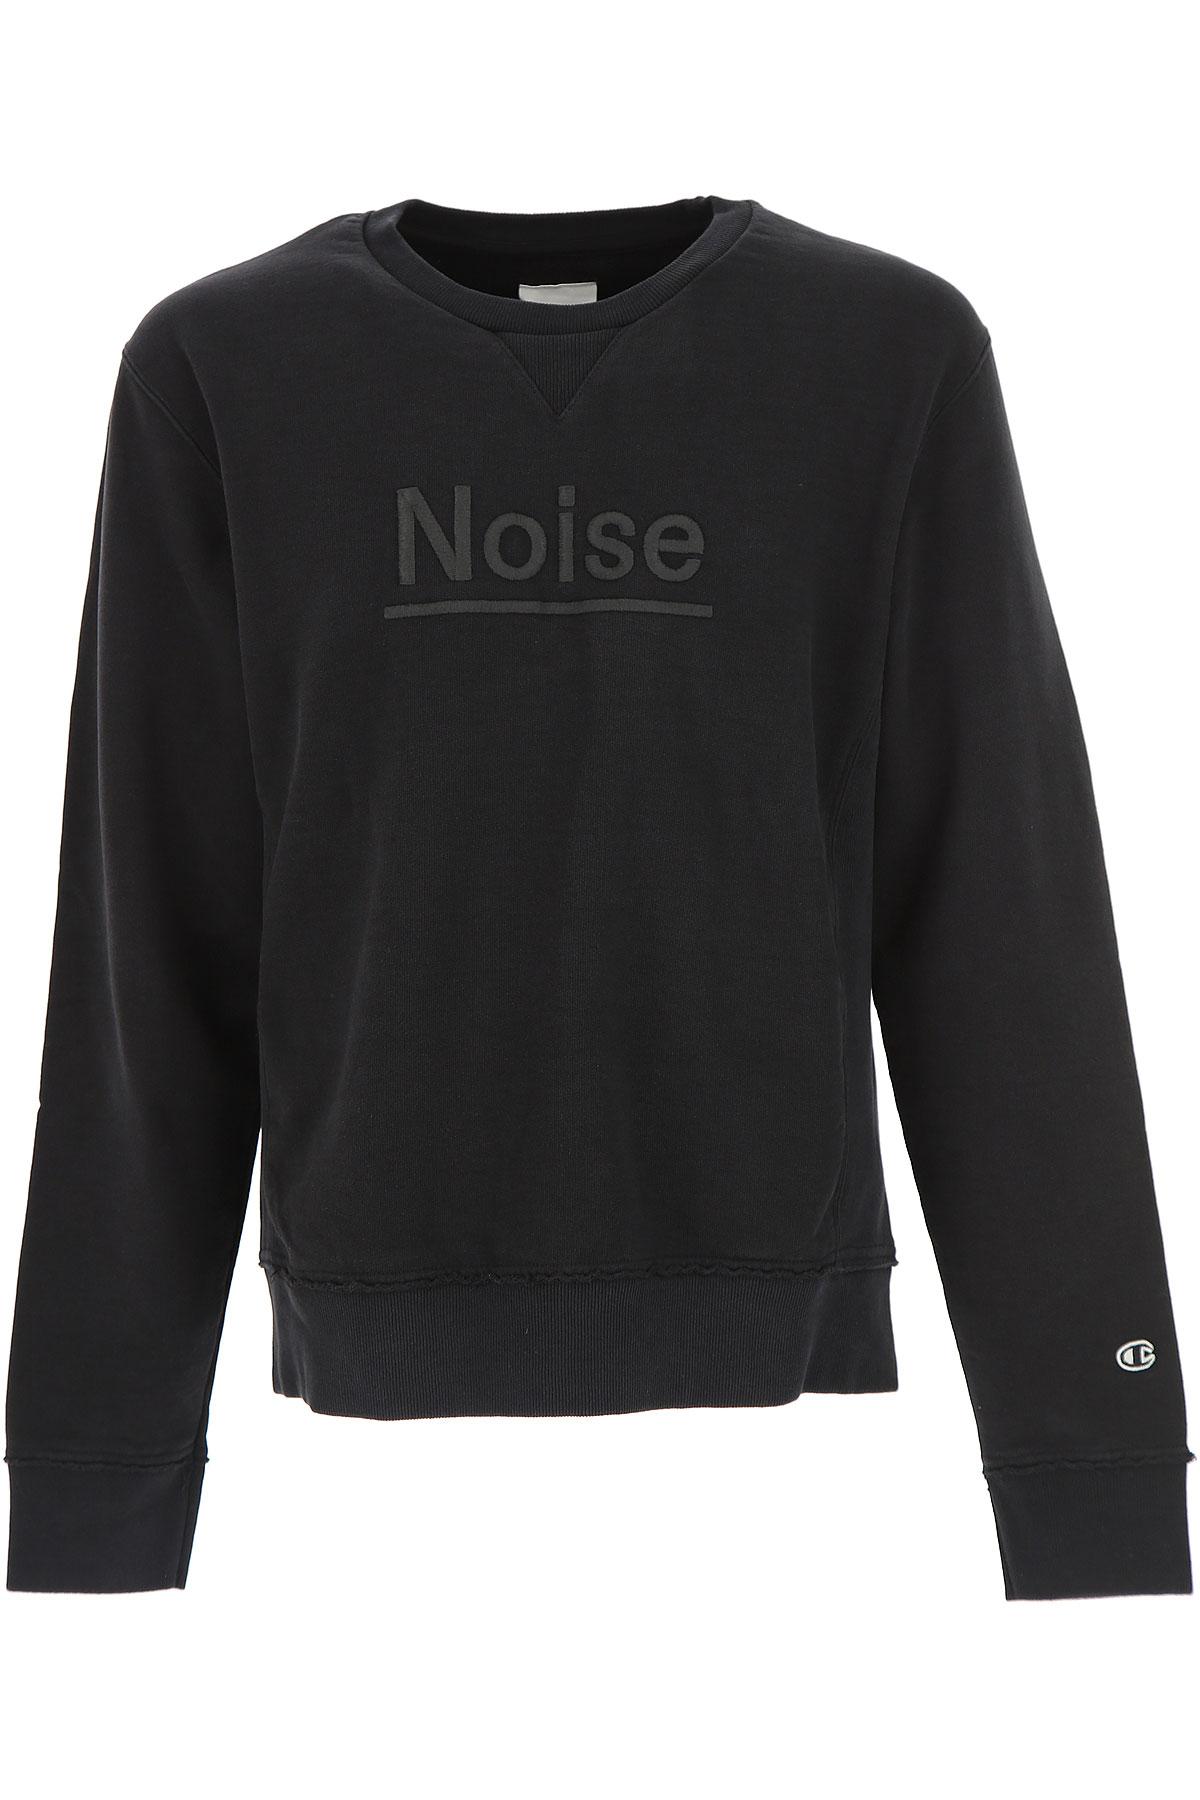 Champion Sweatshirt for Men On Sale, Black, Cotton, 2017, L M S USA-454782